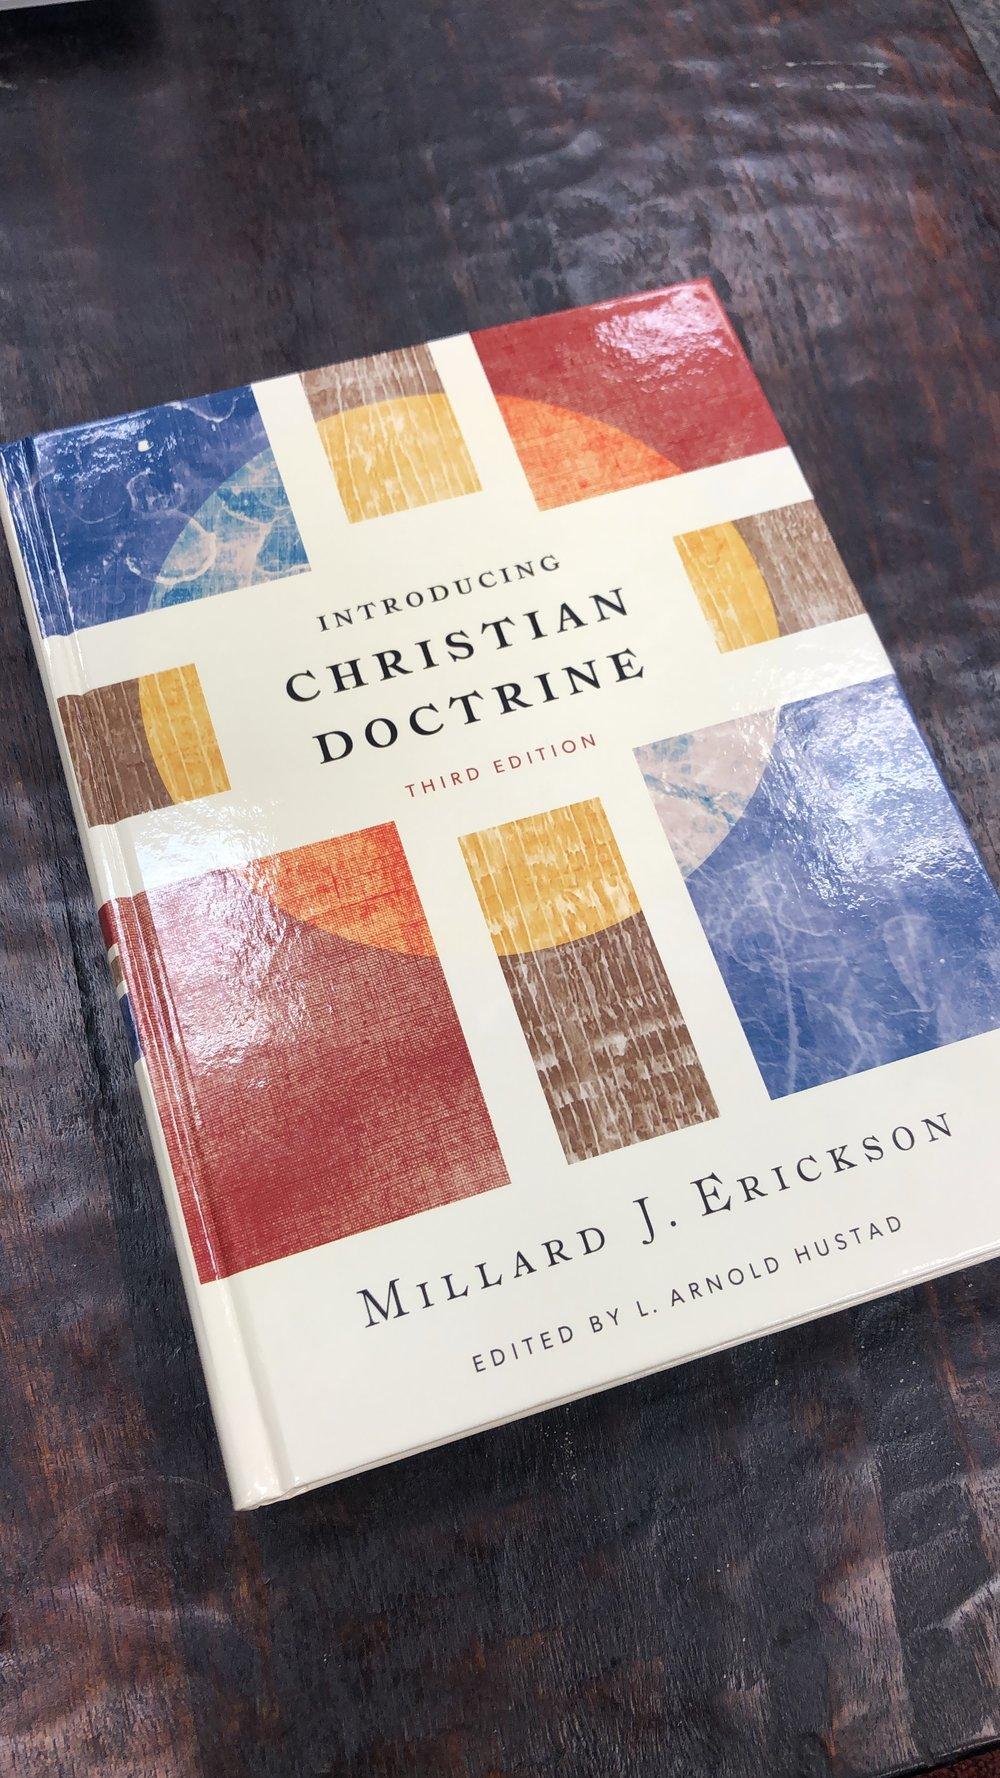 Introducing Christian Doctrine